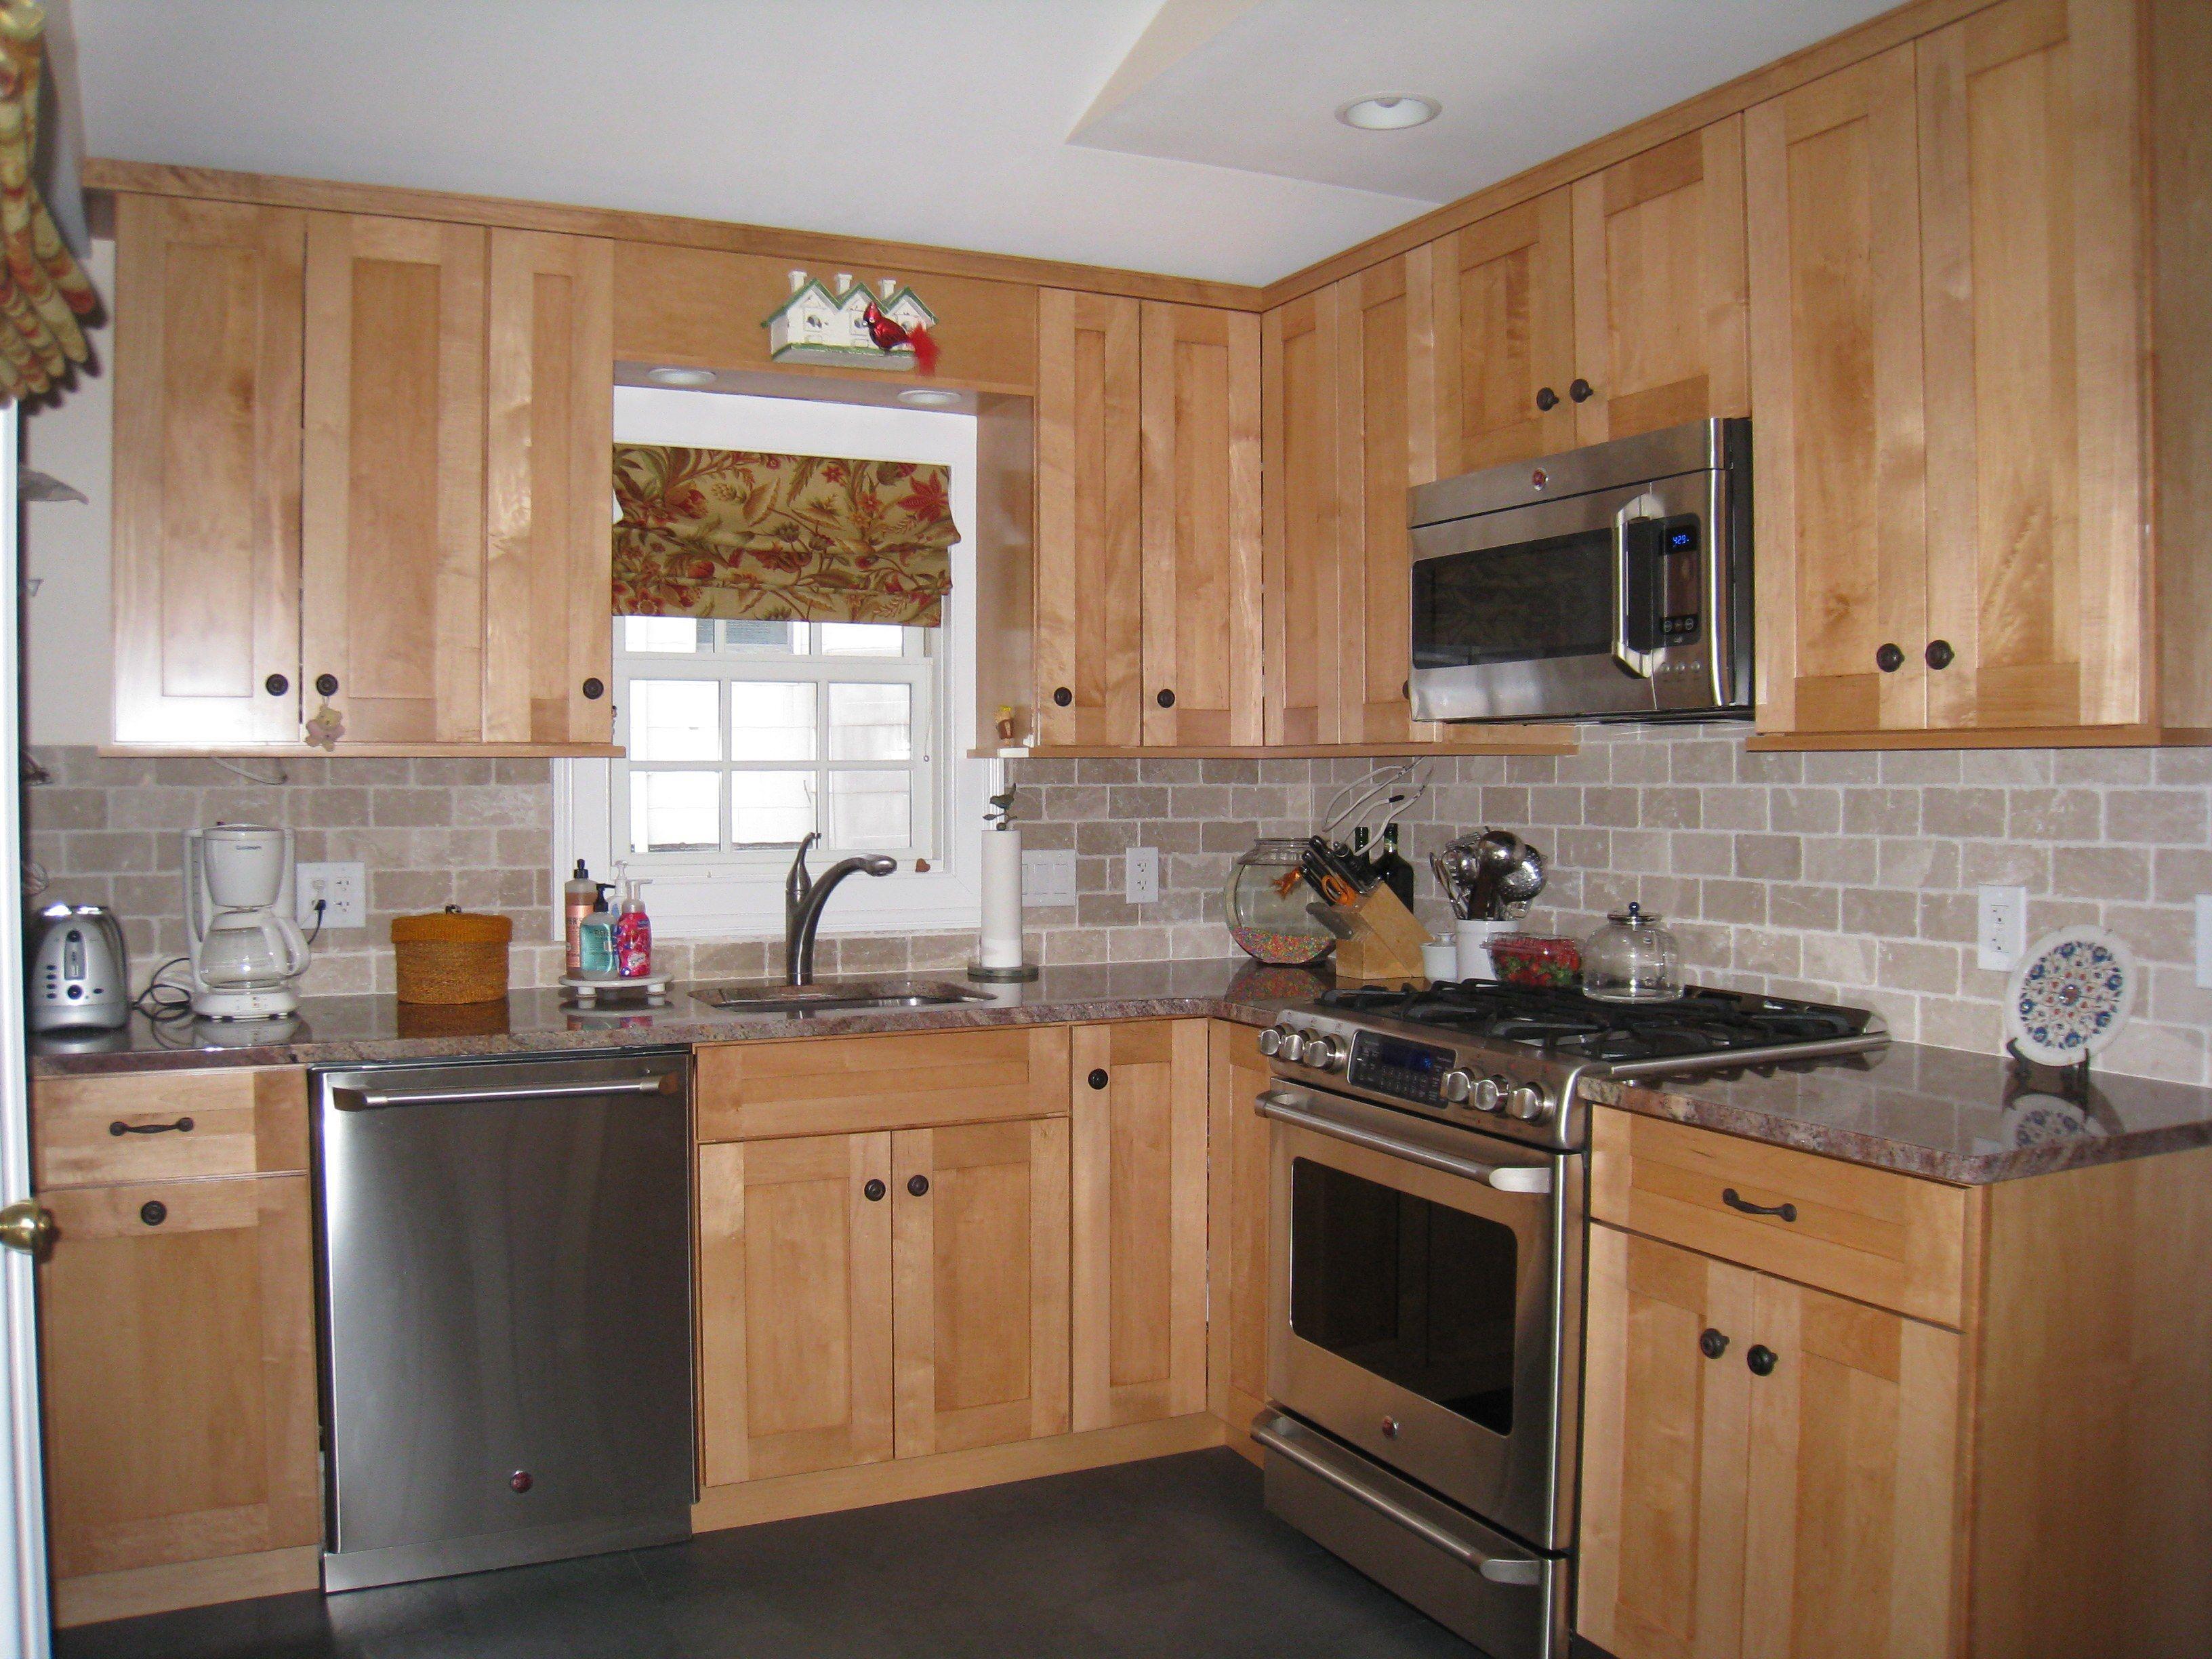 kitchen counters and backsplash Kitchen cabinets